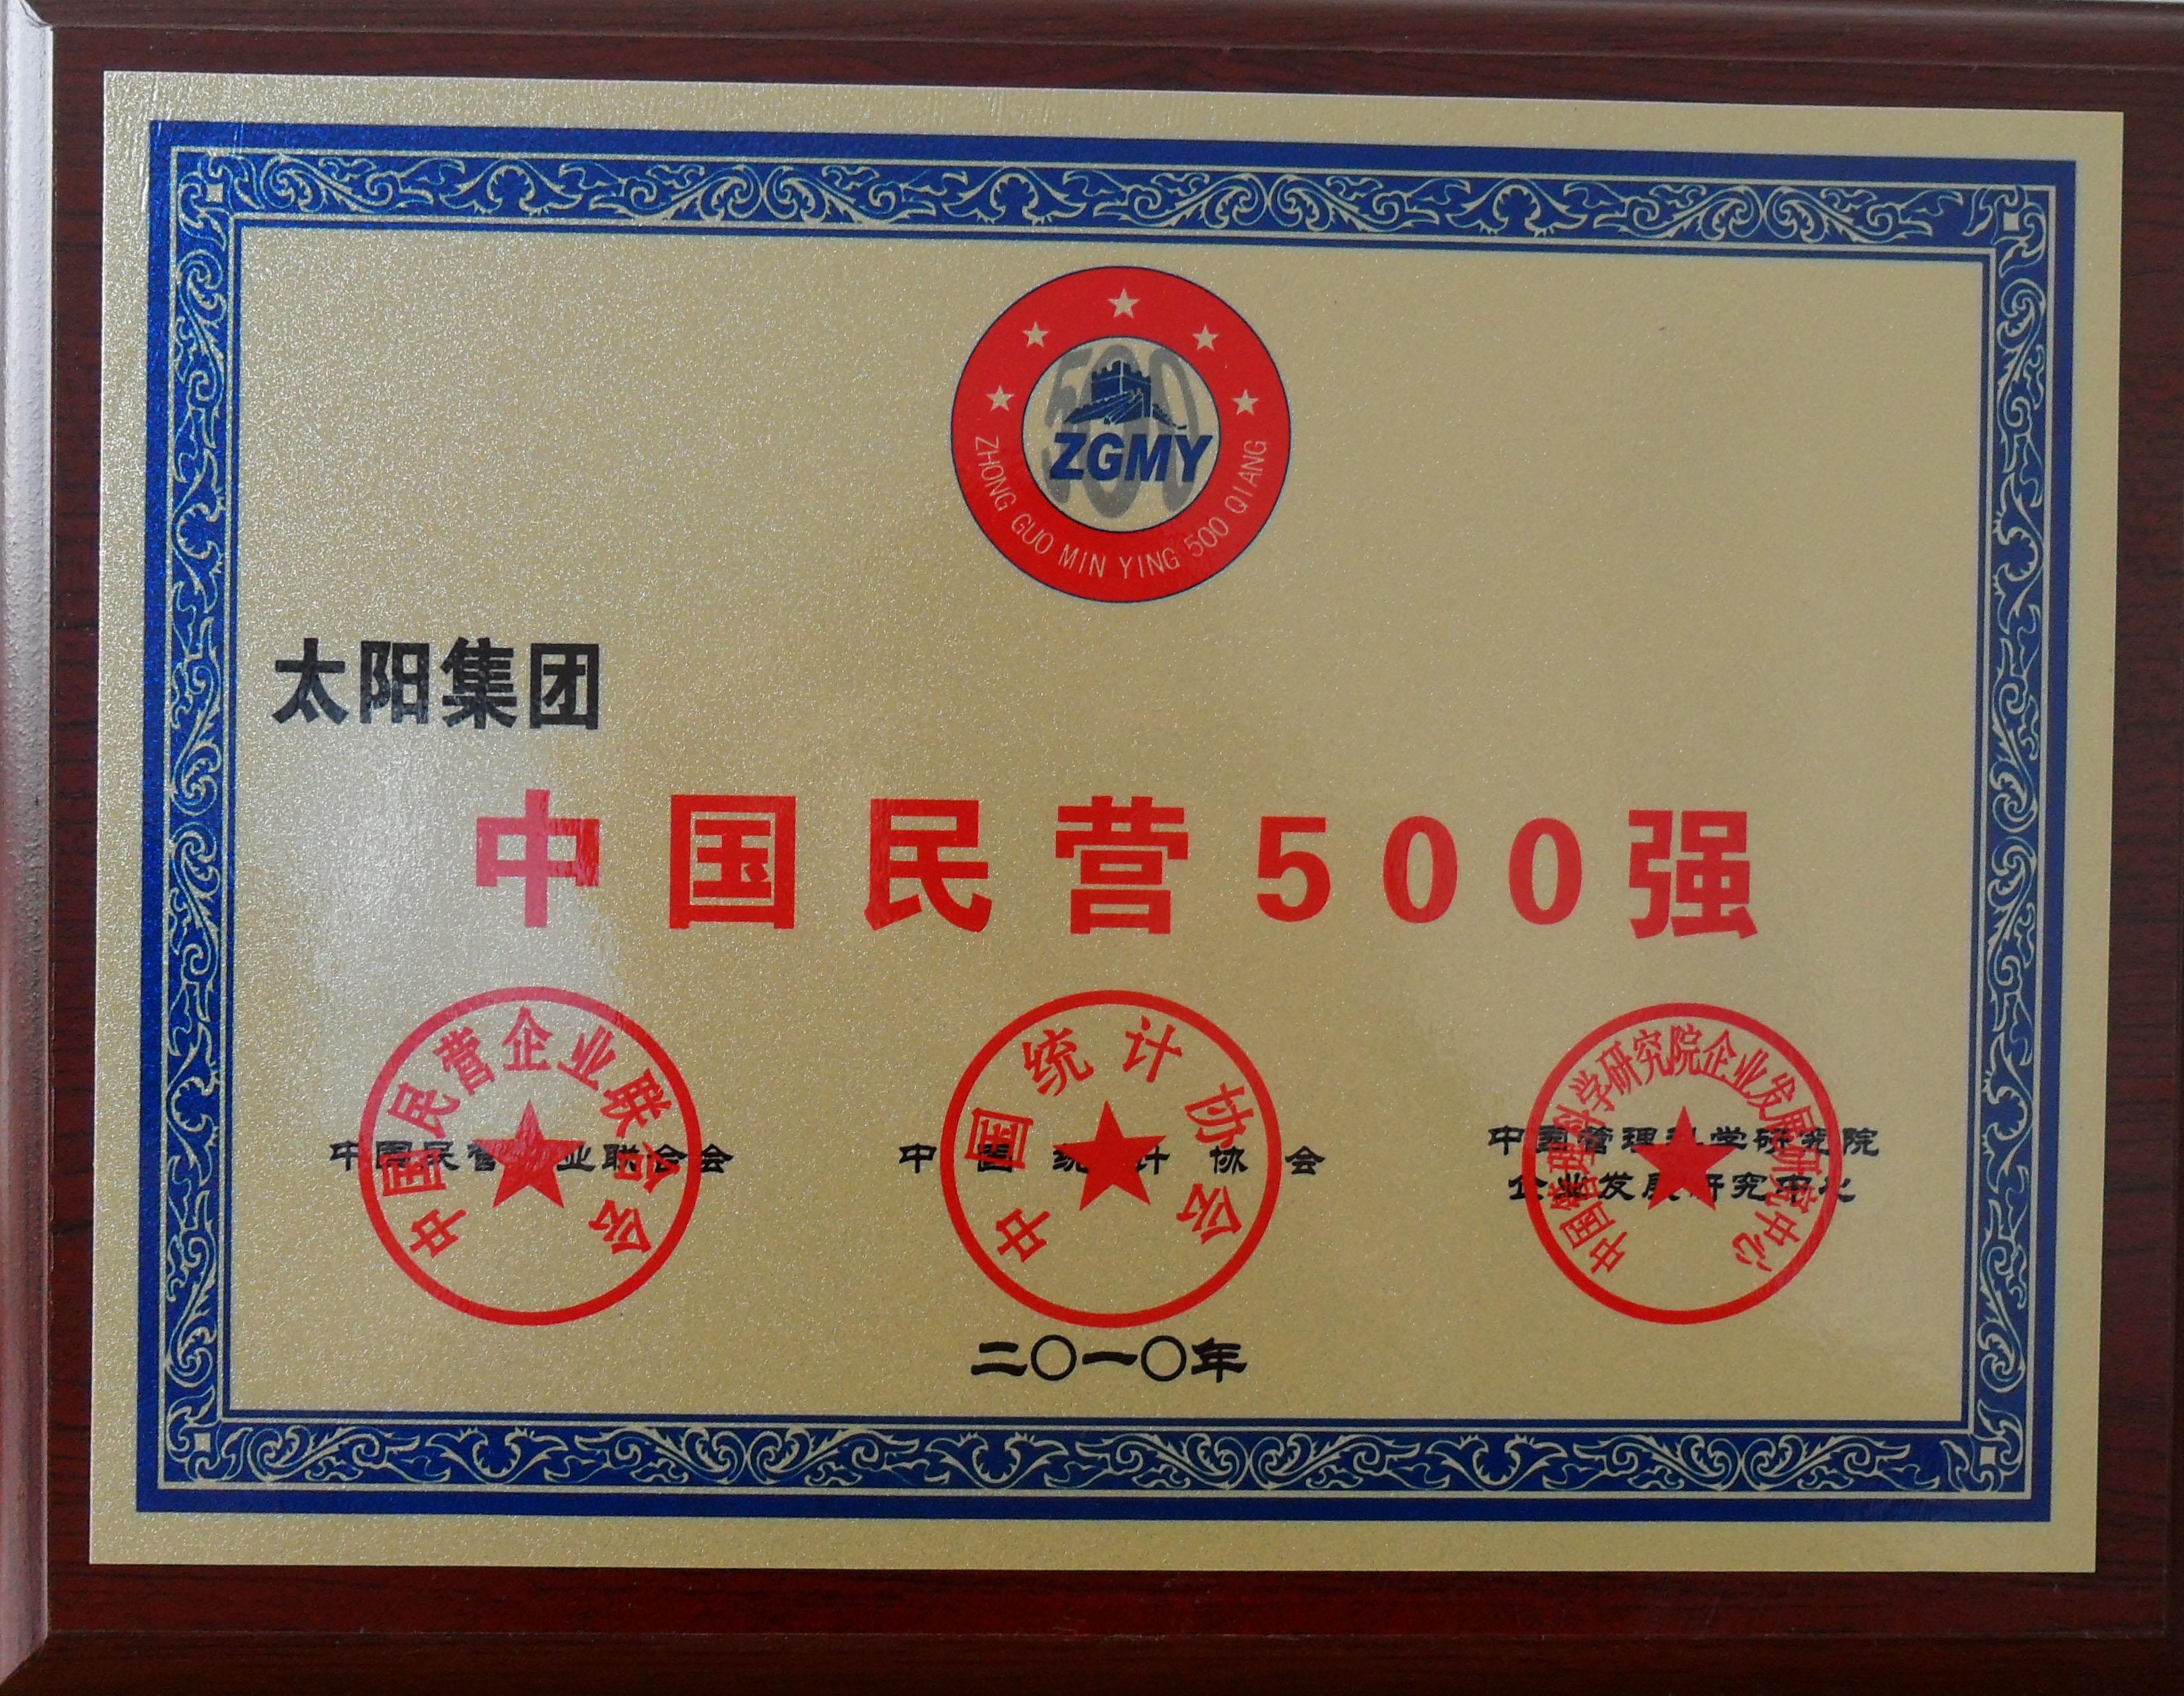 2010民营500强